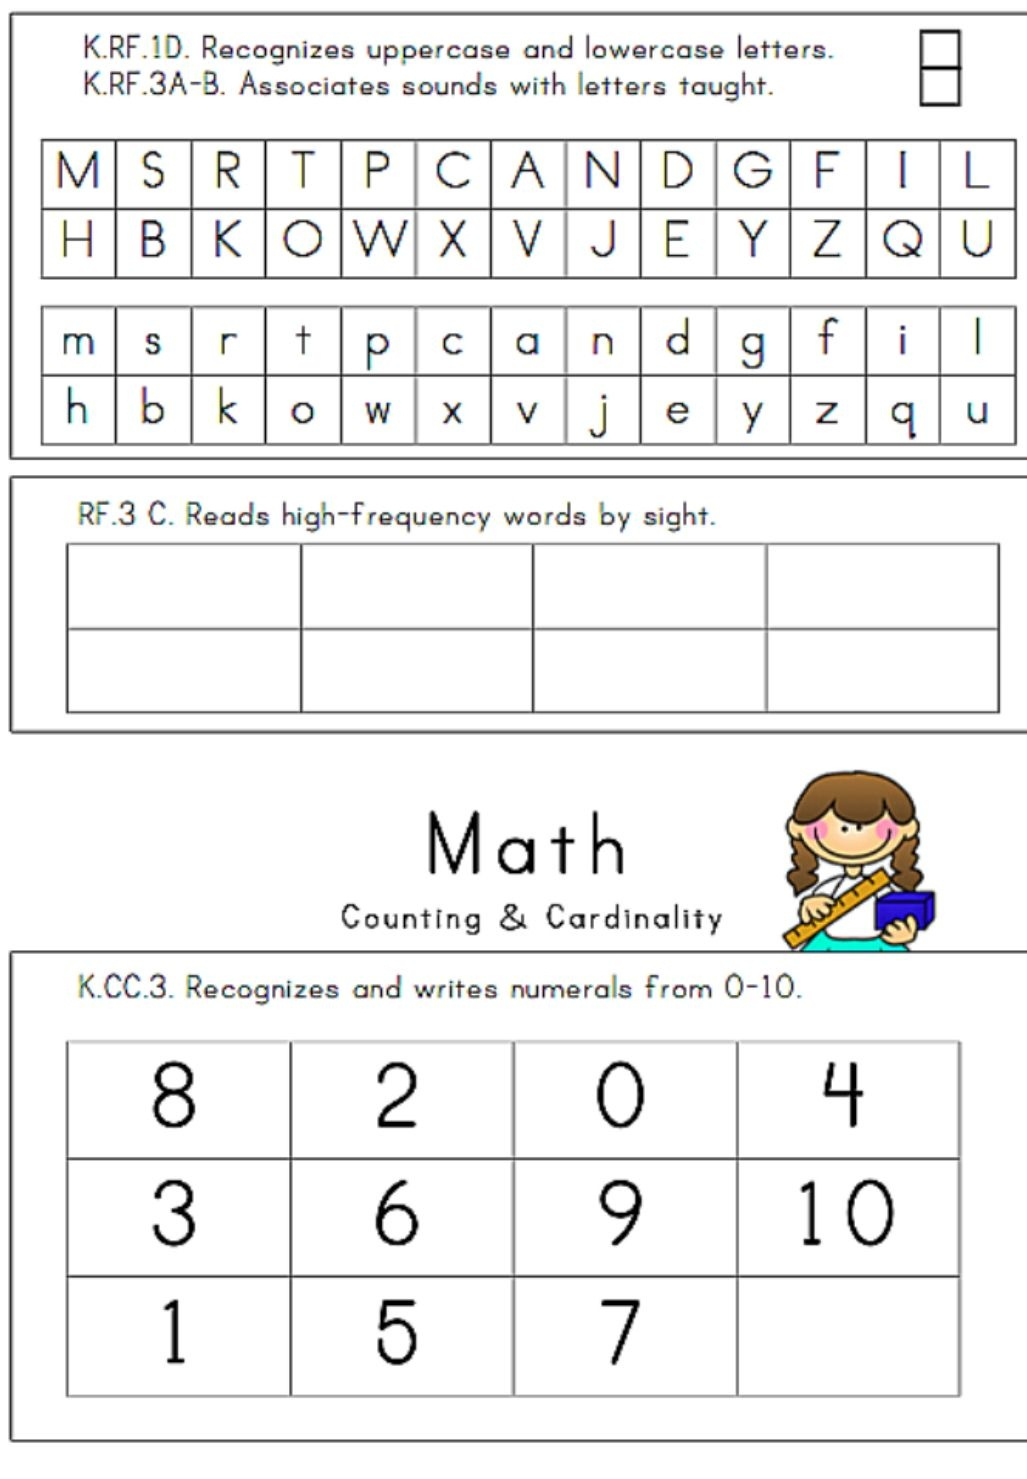 24 Page, Illustrated Kindergarten Assessment   Assessments - Free Printable Informal Math Assessments